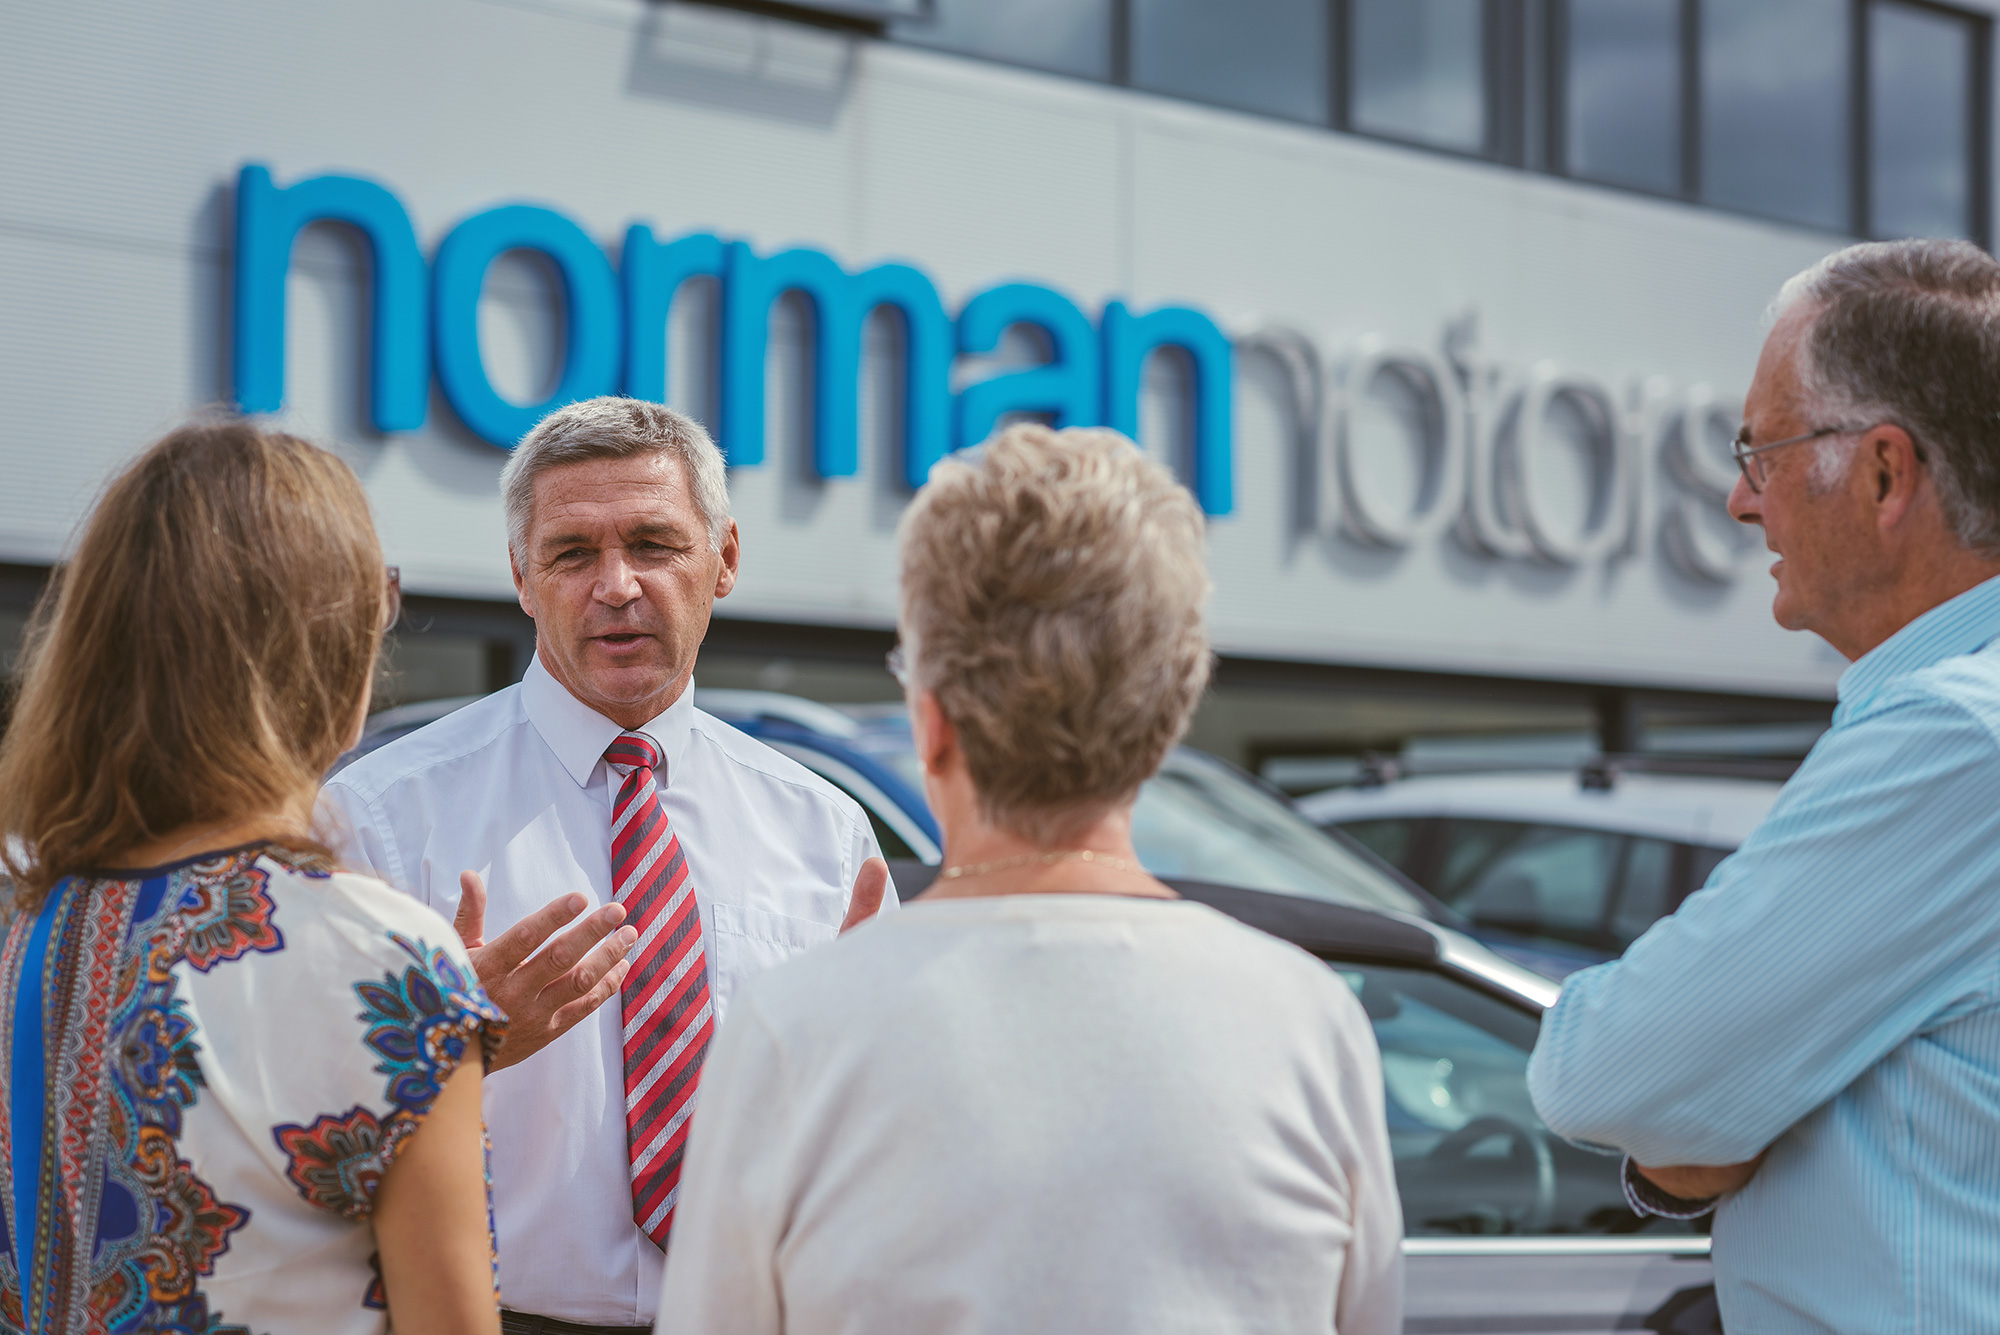 car-sales-photography-3.jpg